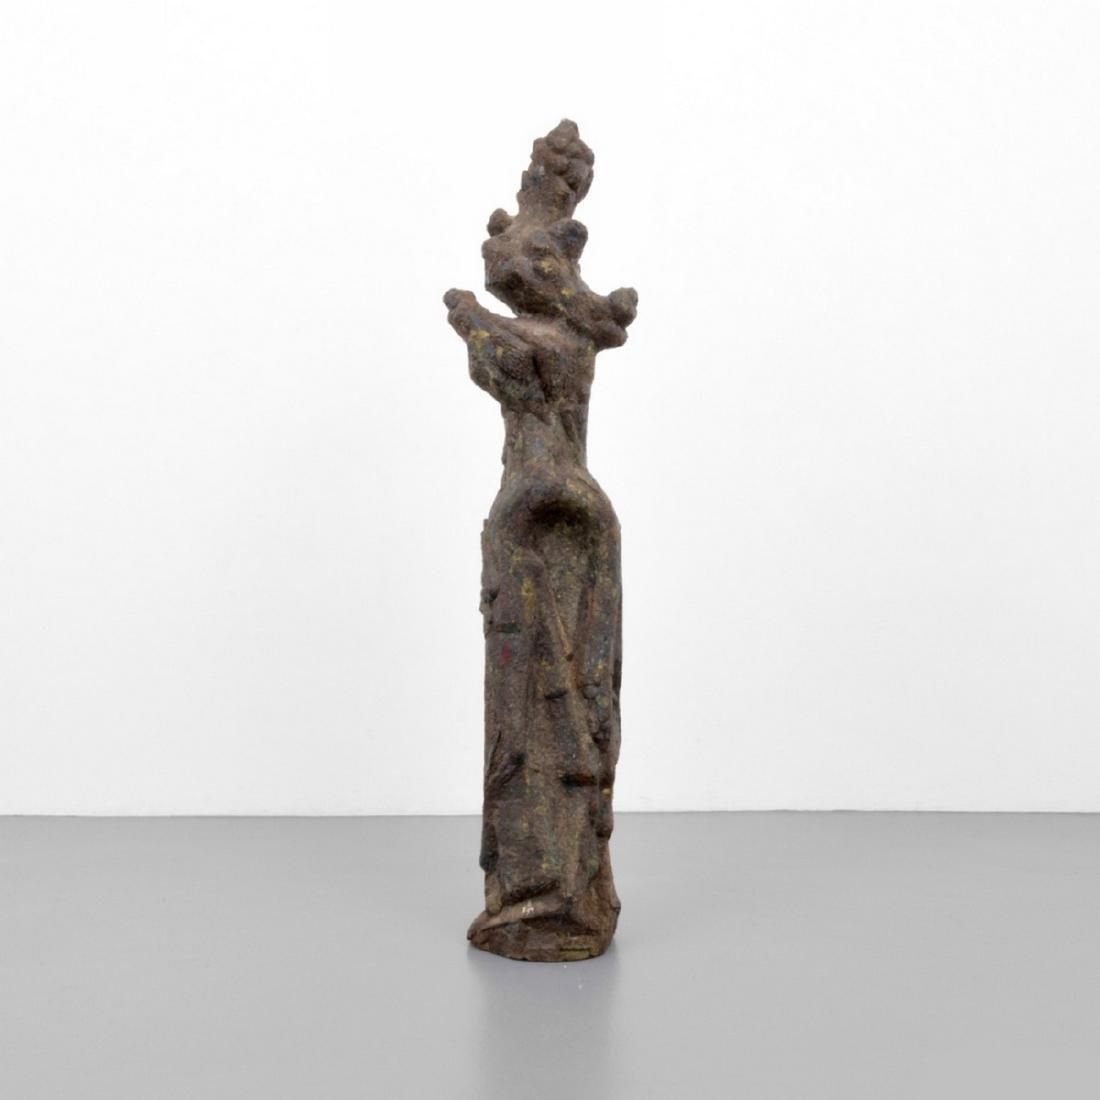 Massive Robert Lohman Sculpture